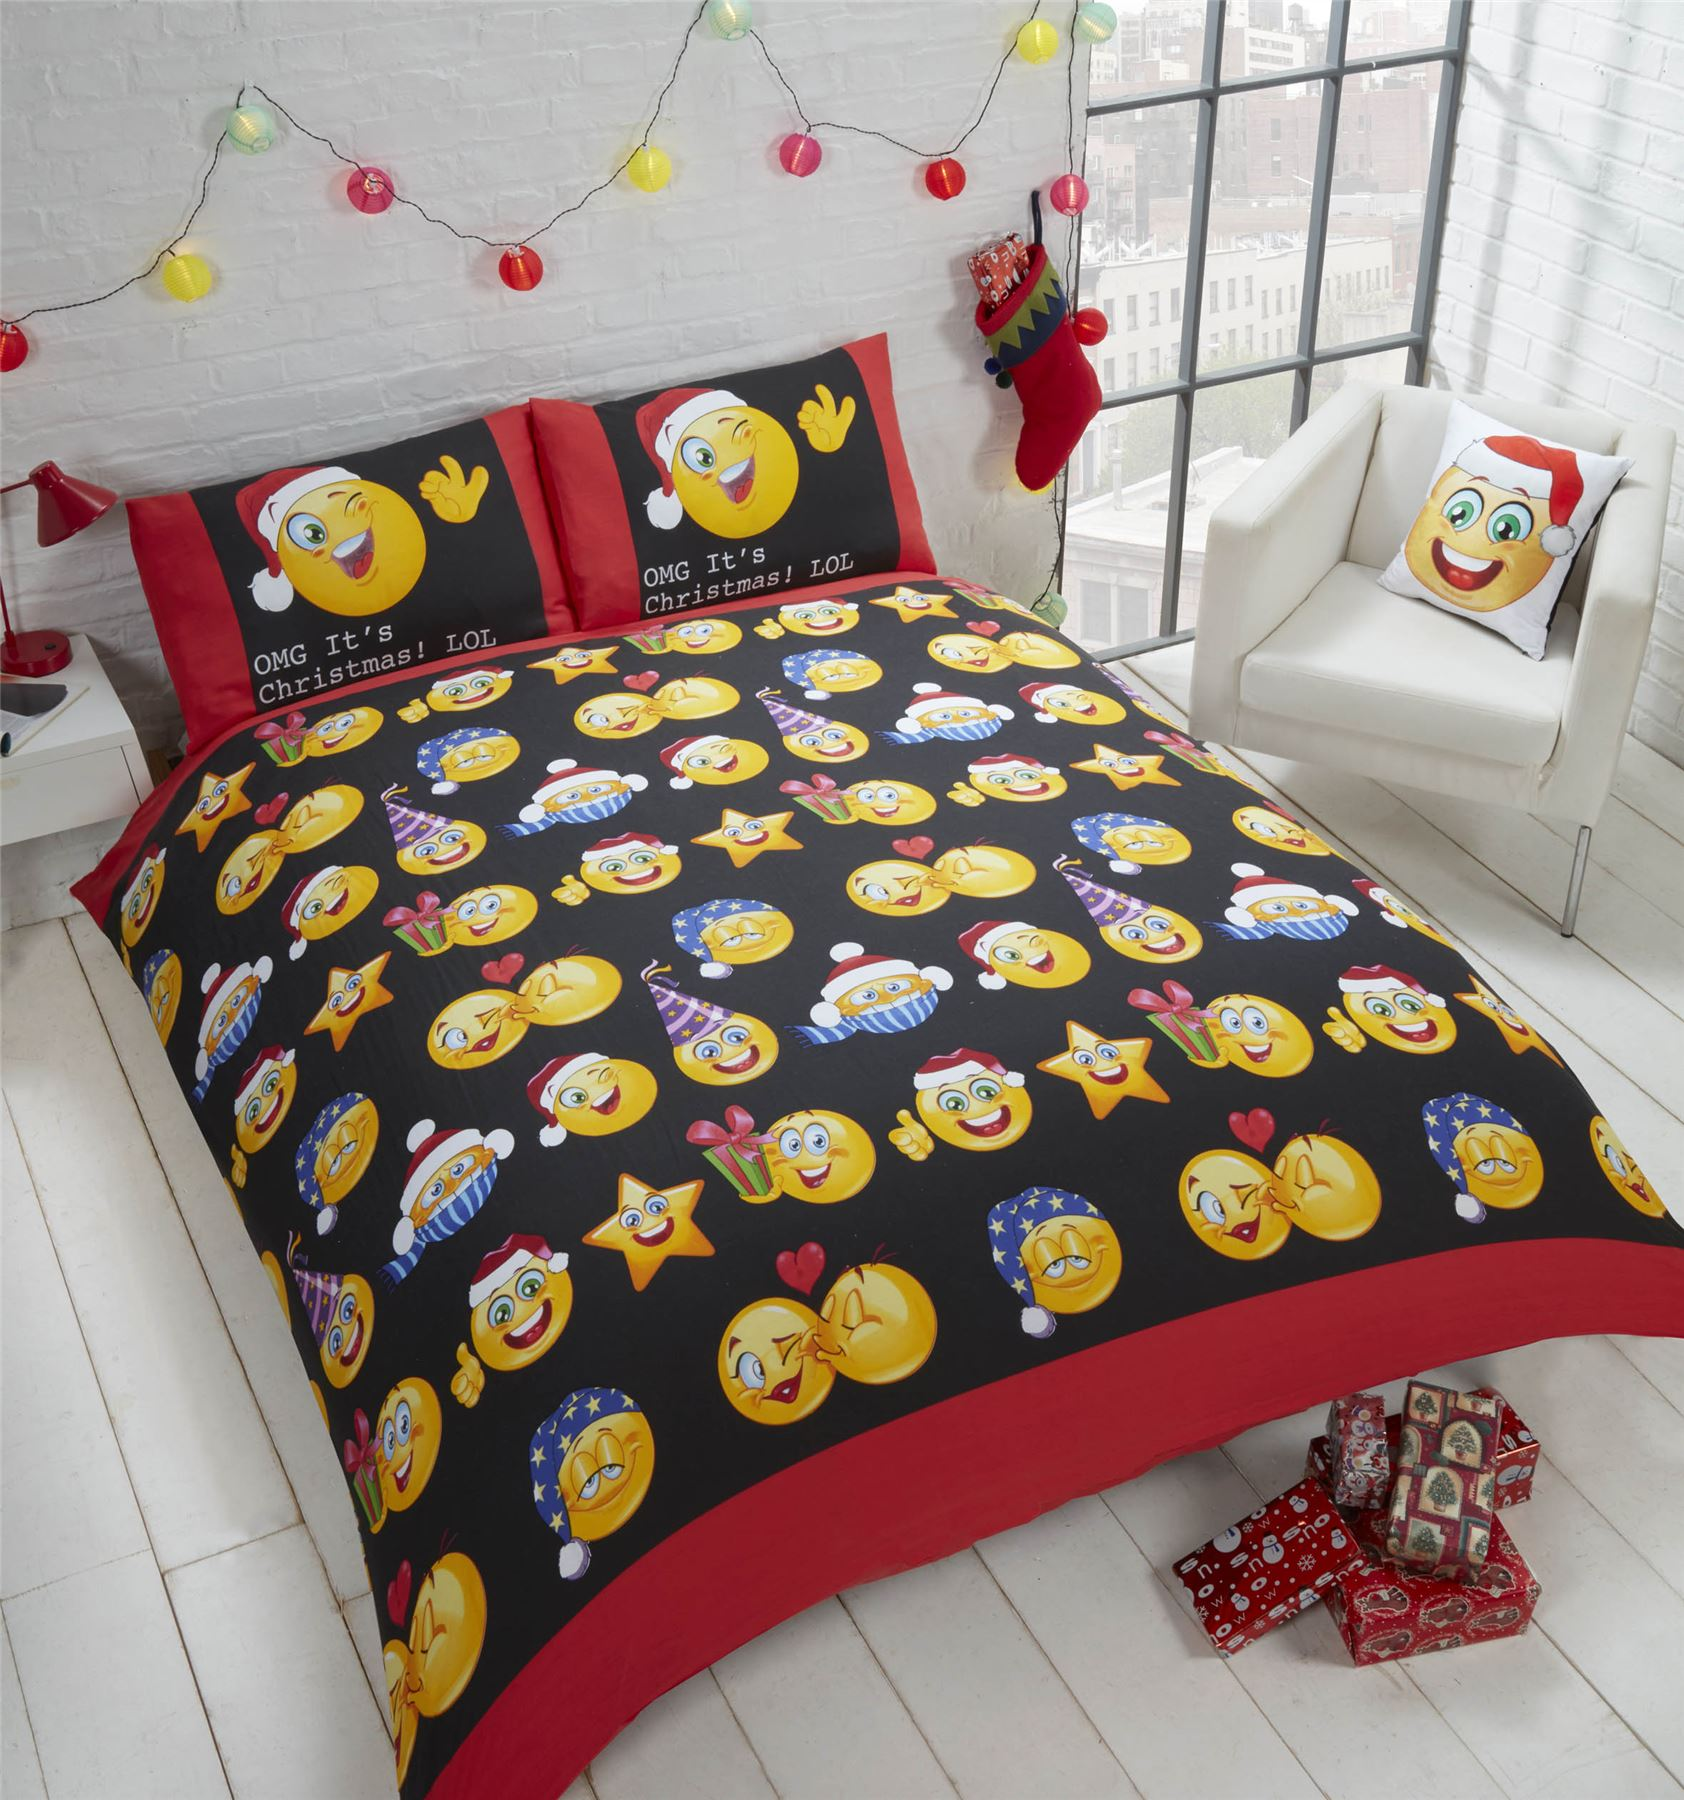 Christmas-2017-NEW-Bedding-Duvet-Cover-Bright-Colourful-Festive-Xmas-Santa